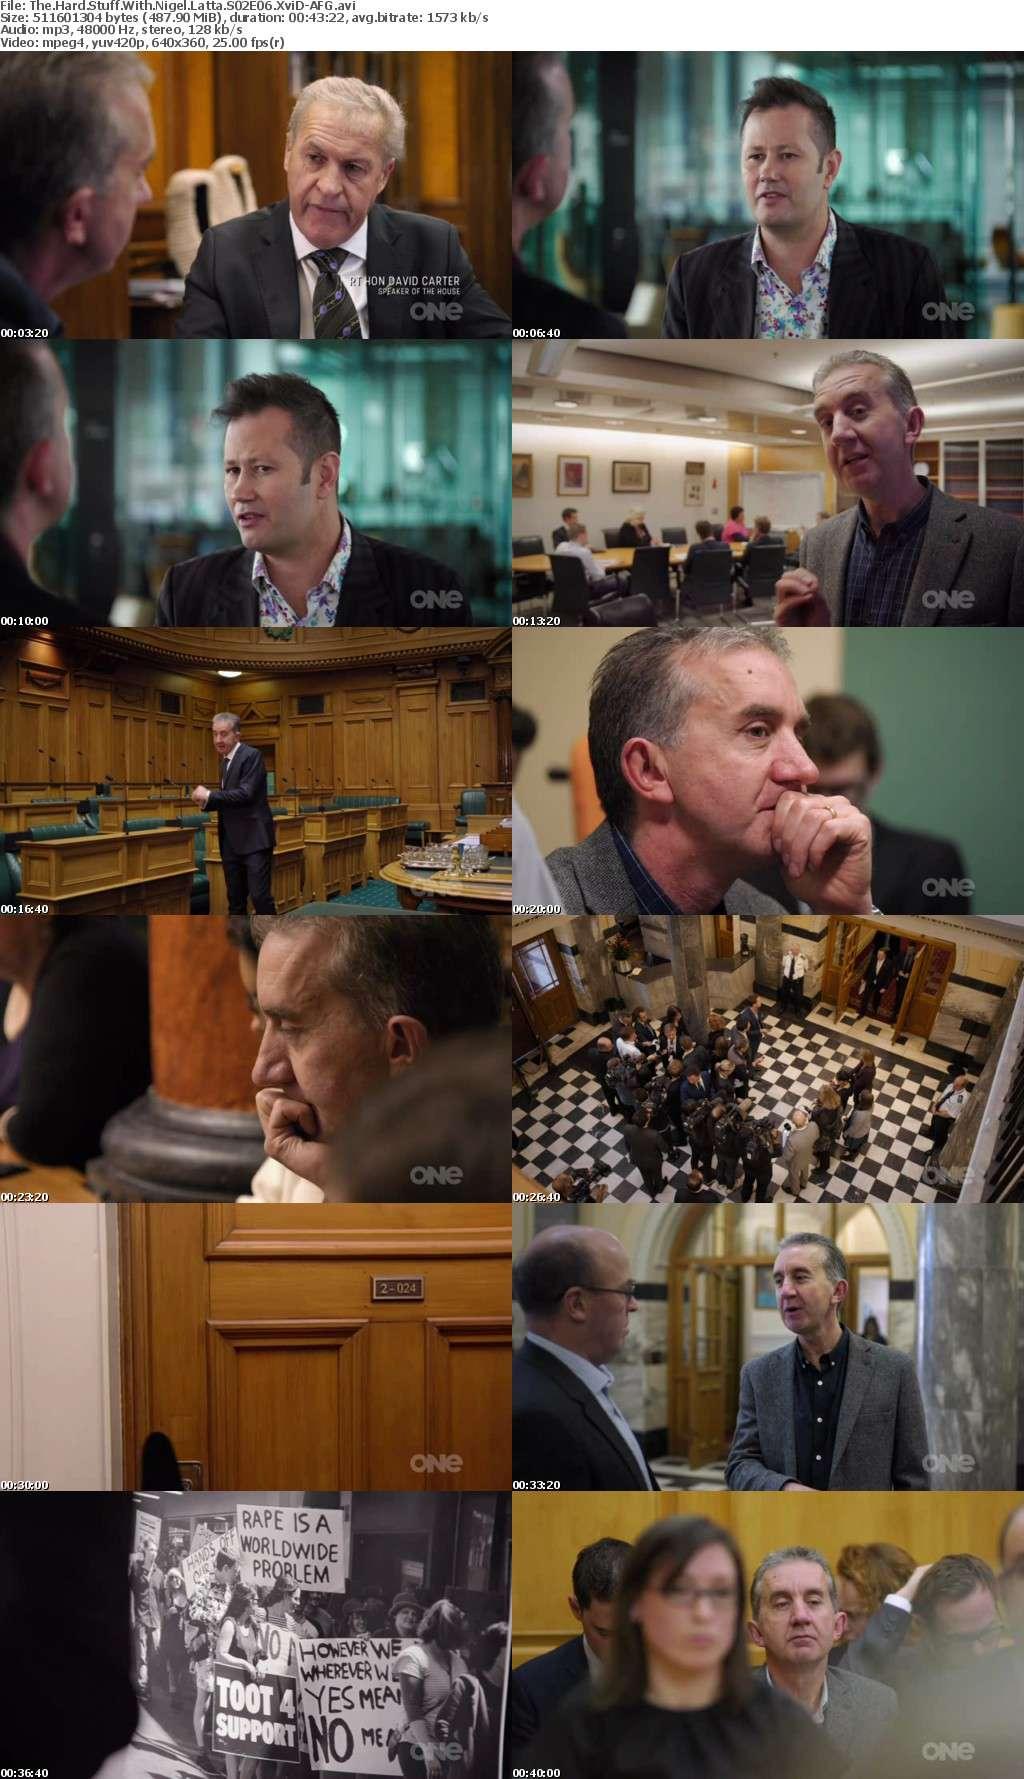 The Hard Stuff With Nigel Latta S02E06 XviD-AFG